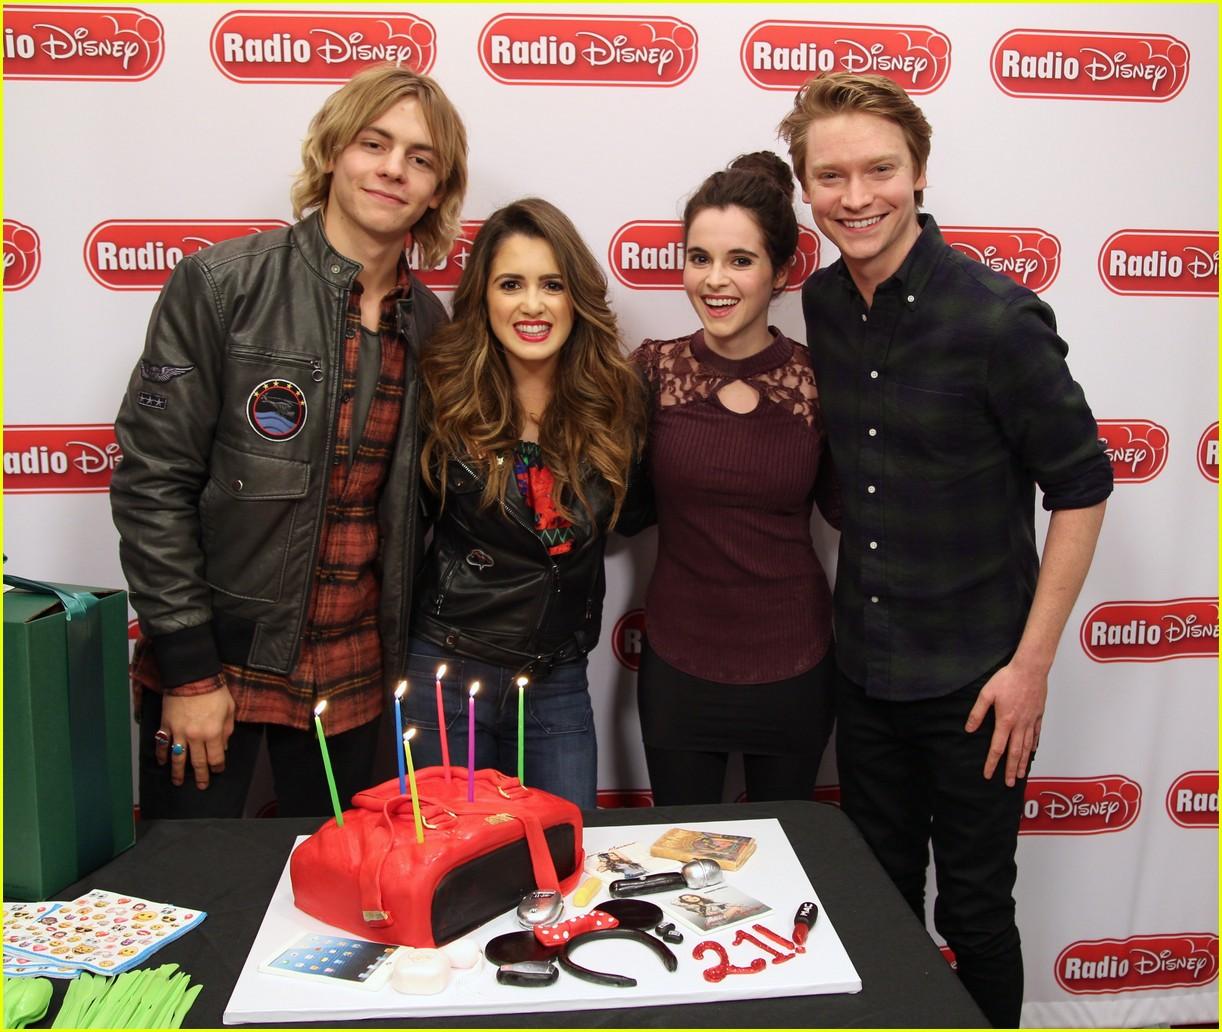 ross lynch surprises laura marano birthday radio disney 01